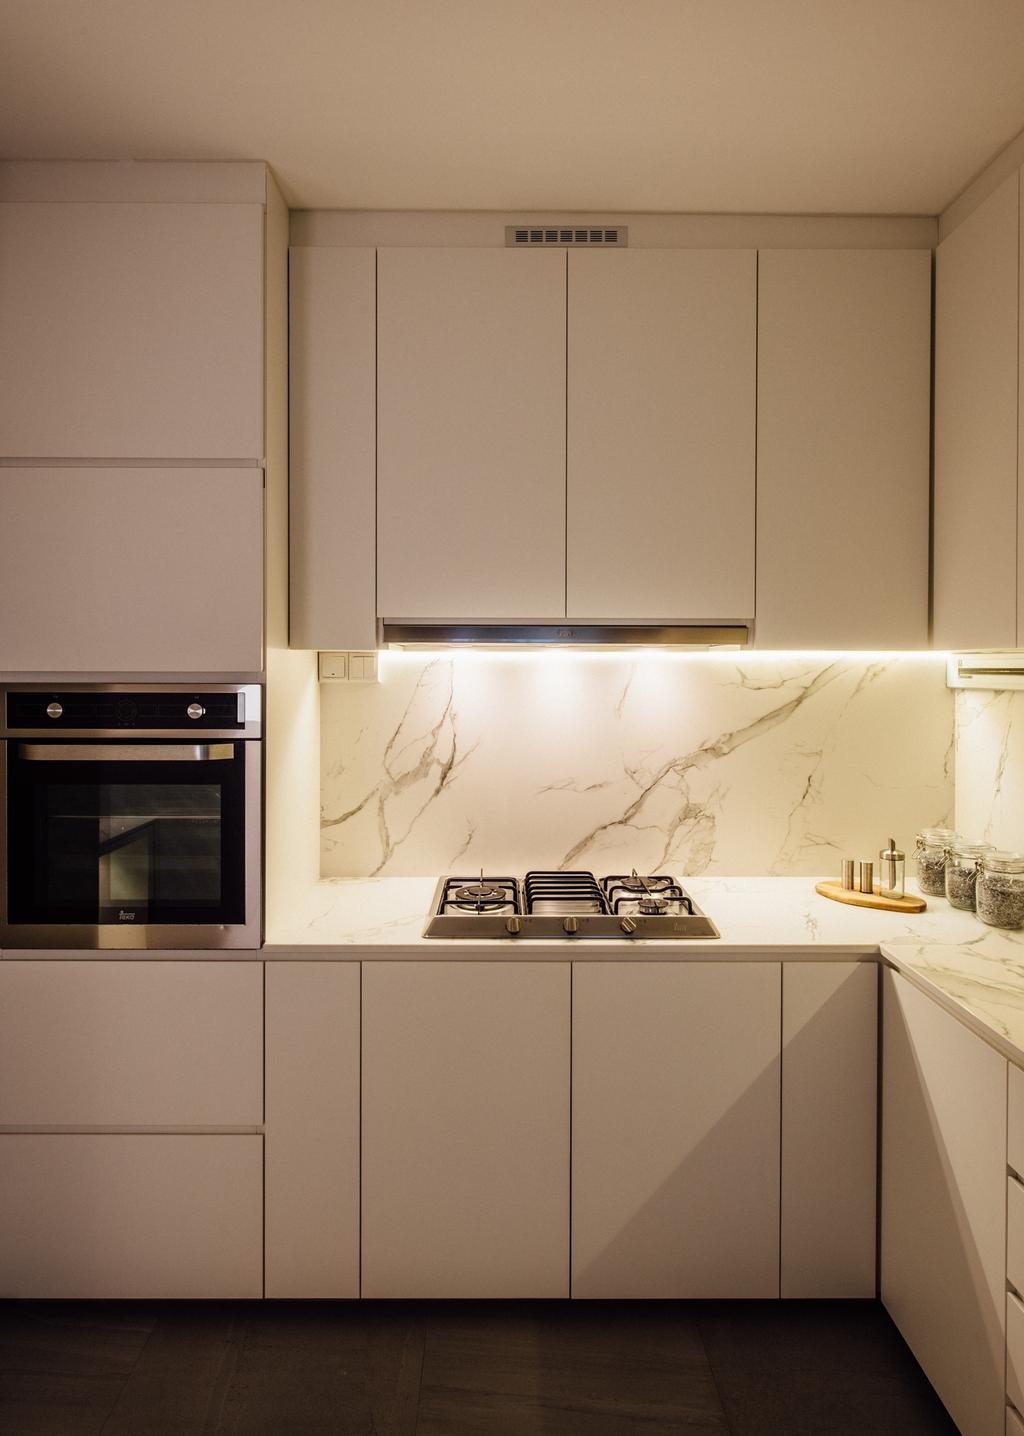 Contemporary, HDB, Kitchen, Tampines Street 72, Interior Designer, Fatema Design Studio, Sink, Appliance, Electrical Device, Microwave, Oven, Indoors, Interior Design, Room